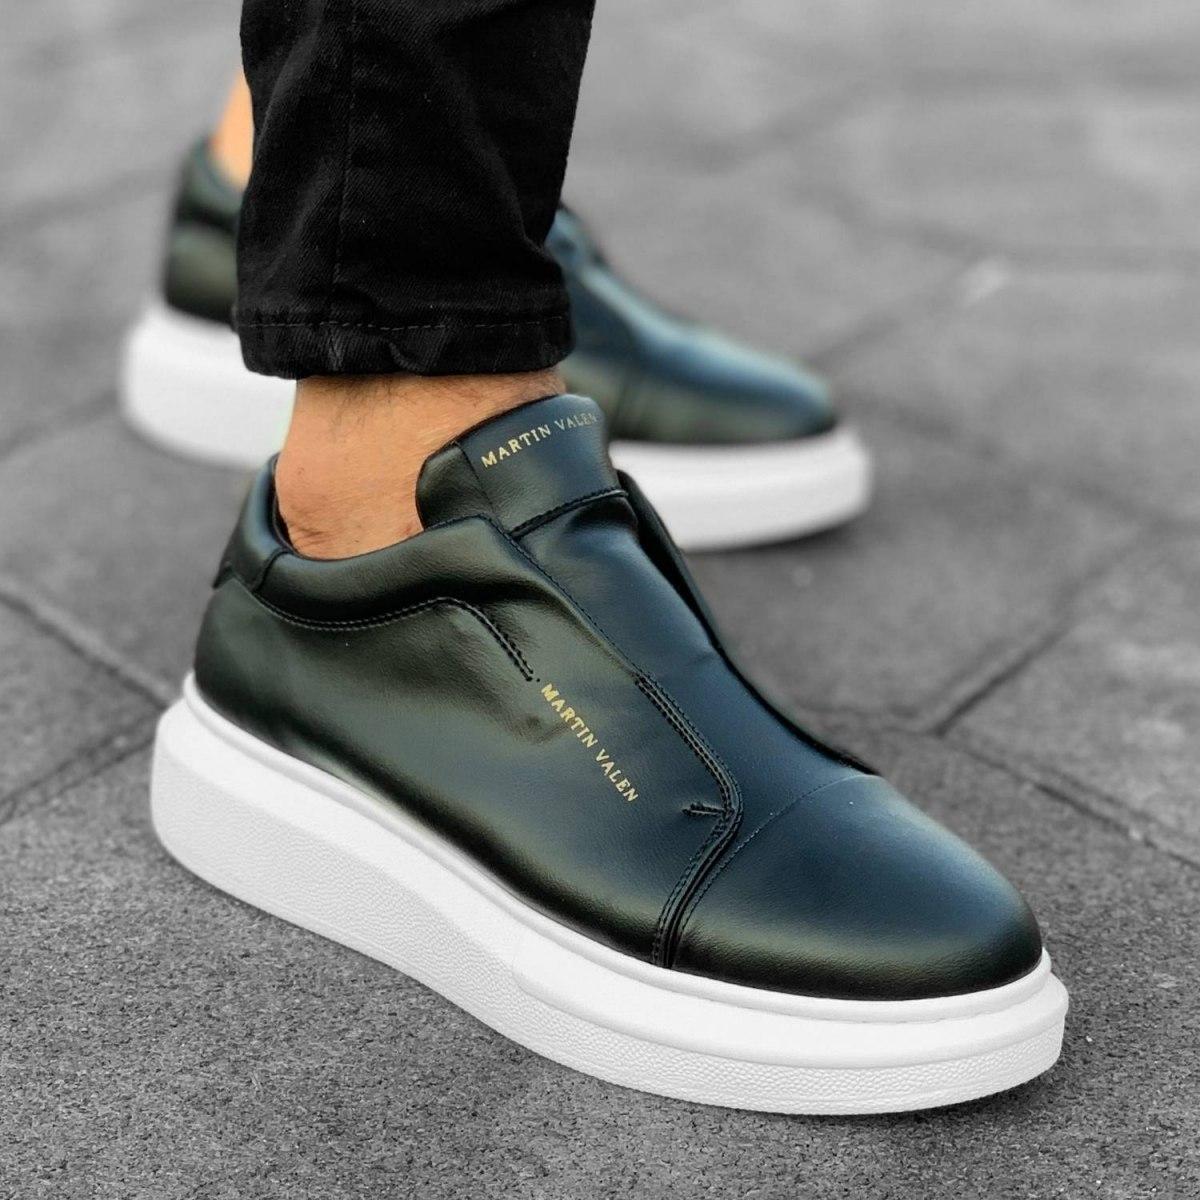 Wagoon Slip-on Sneakers in...